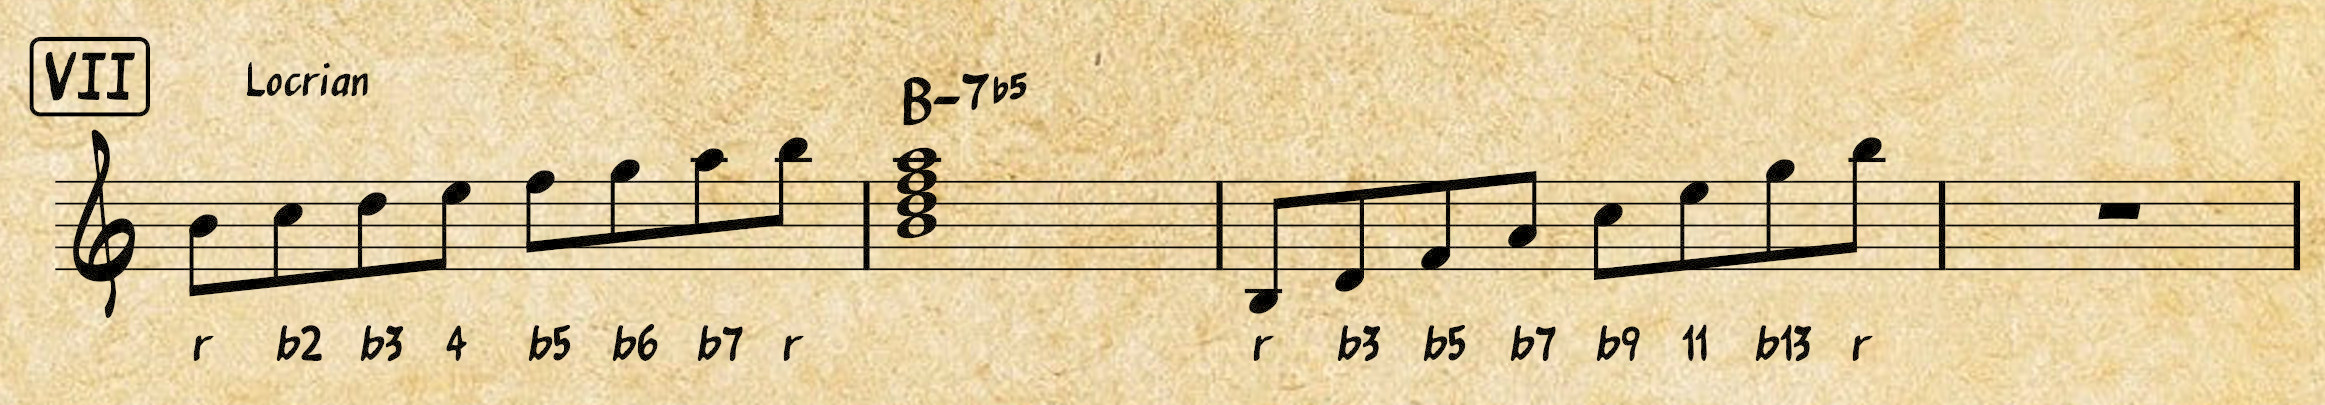 Western Music Theory: Locrian